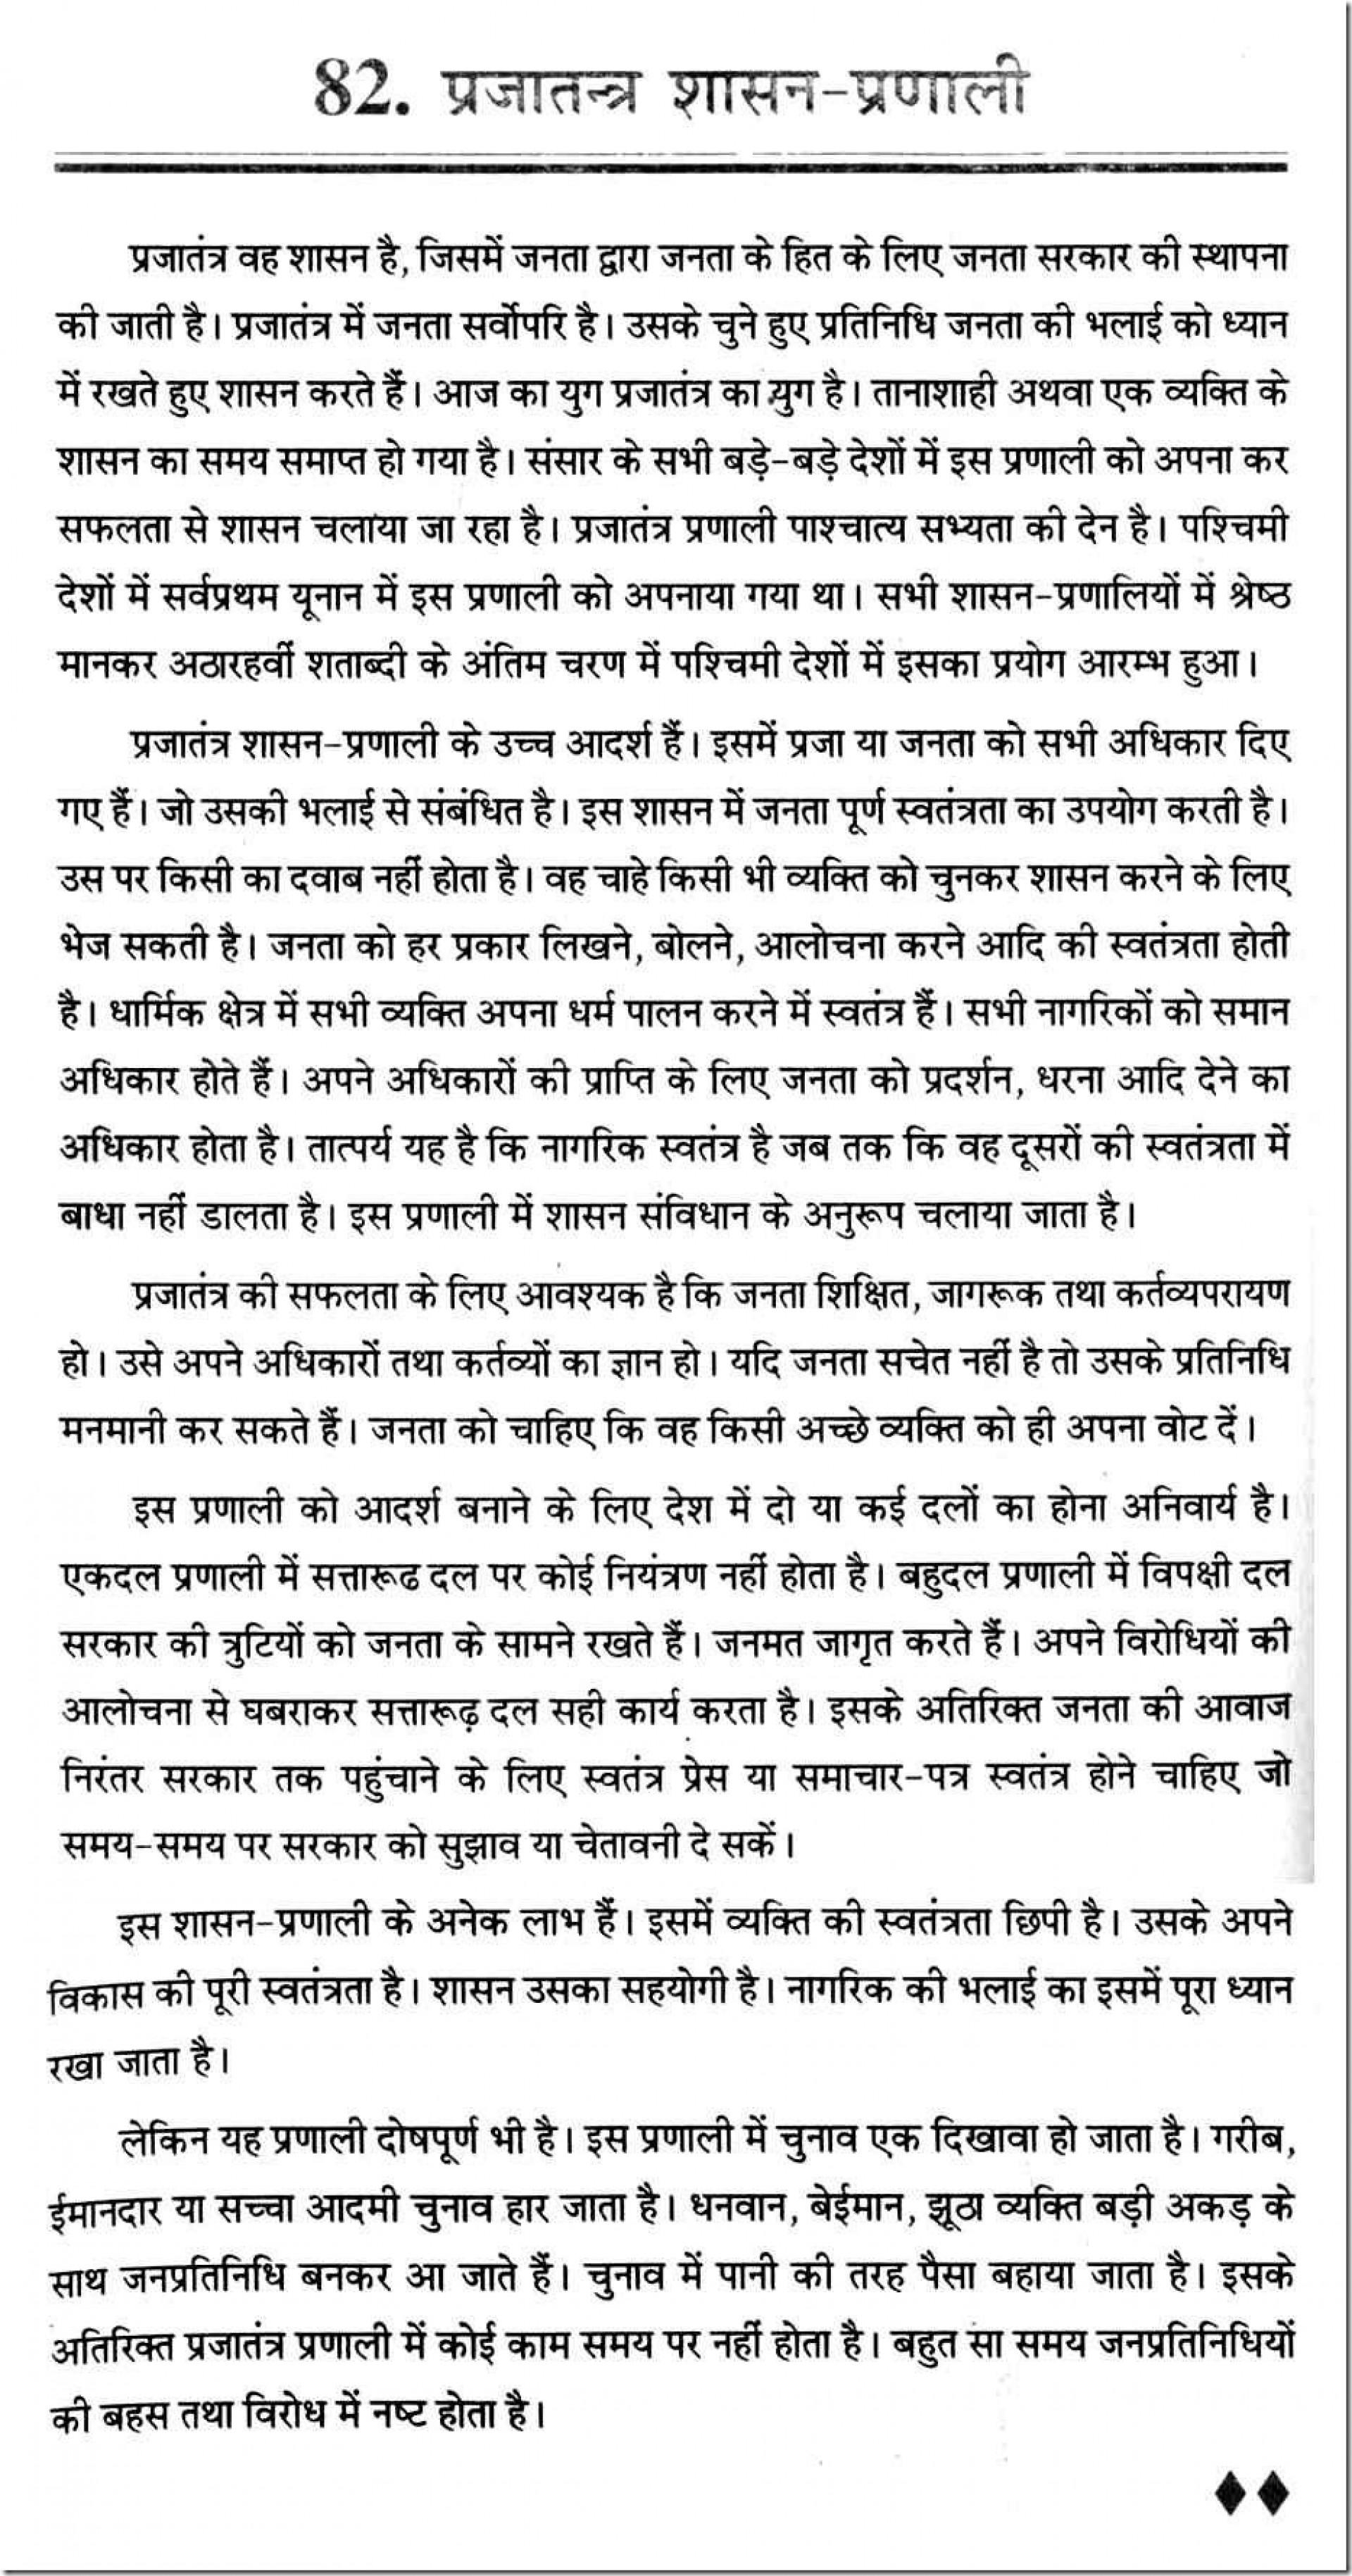 011 Essay Importance Democracy Thumb Of Voting Pdf In Kannada The Essays English Tamil Rights India Hindi On Punjabi Persuasive Unforgettable Marathi 1920